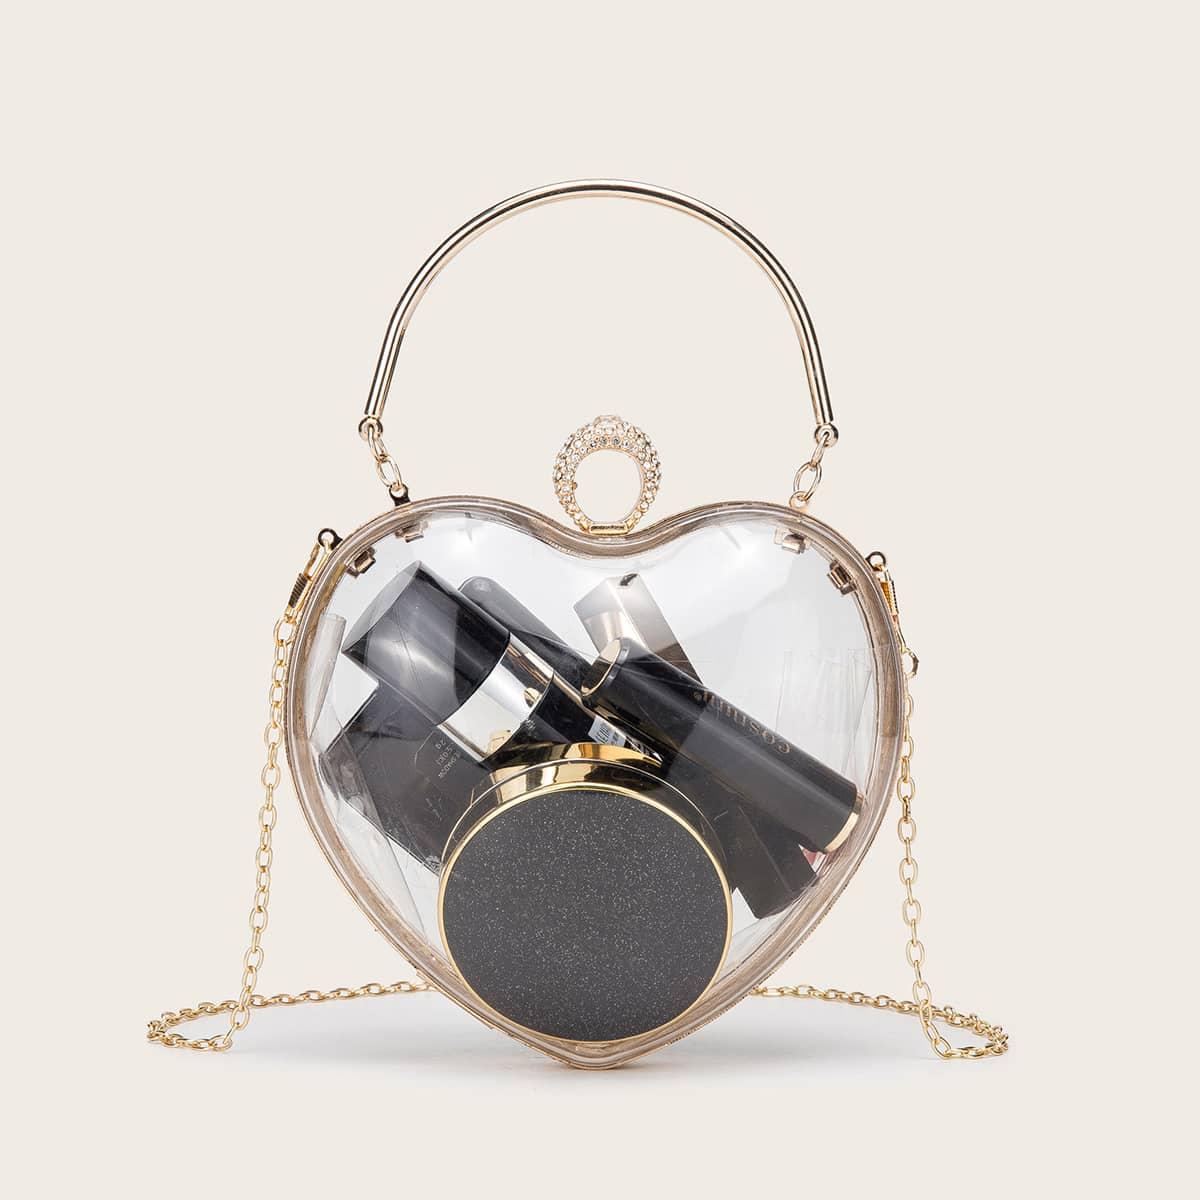 shein Hartvormige clutch met transparante strass-versiering